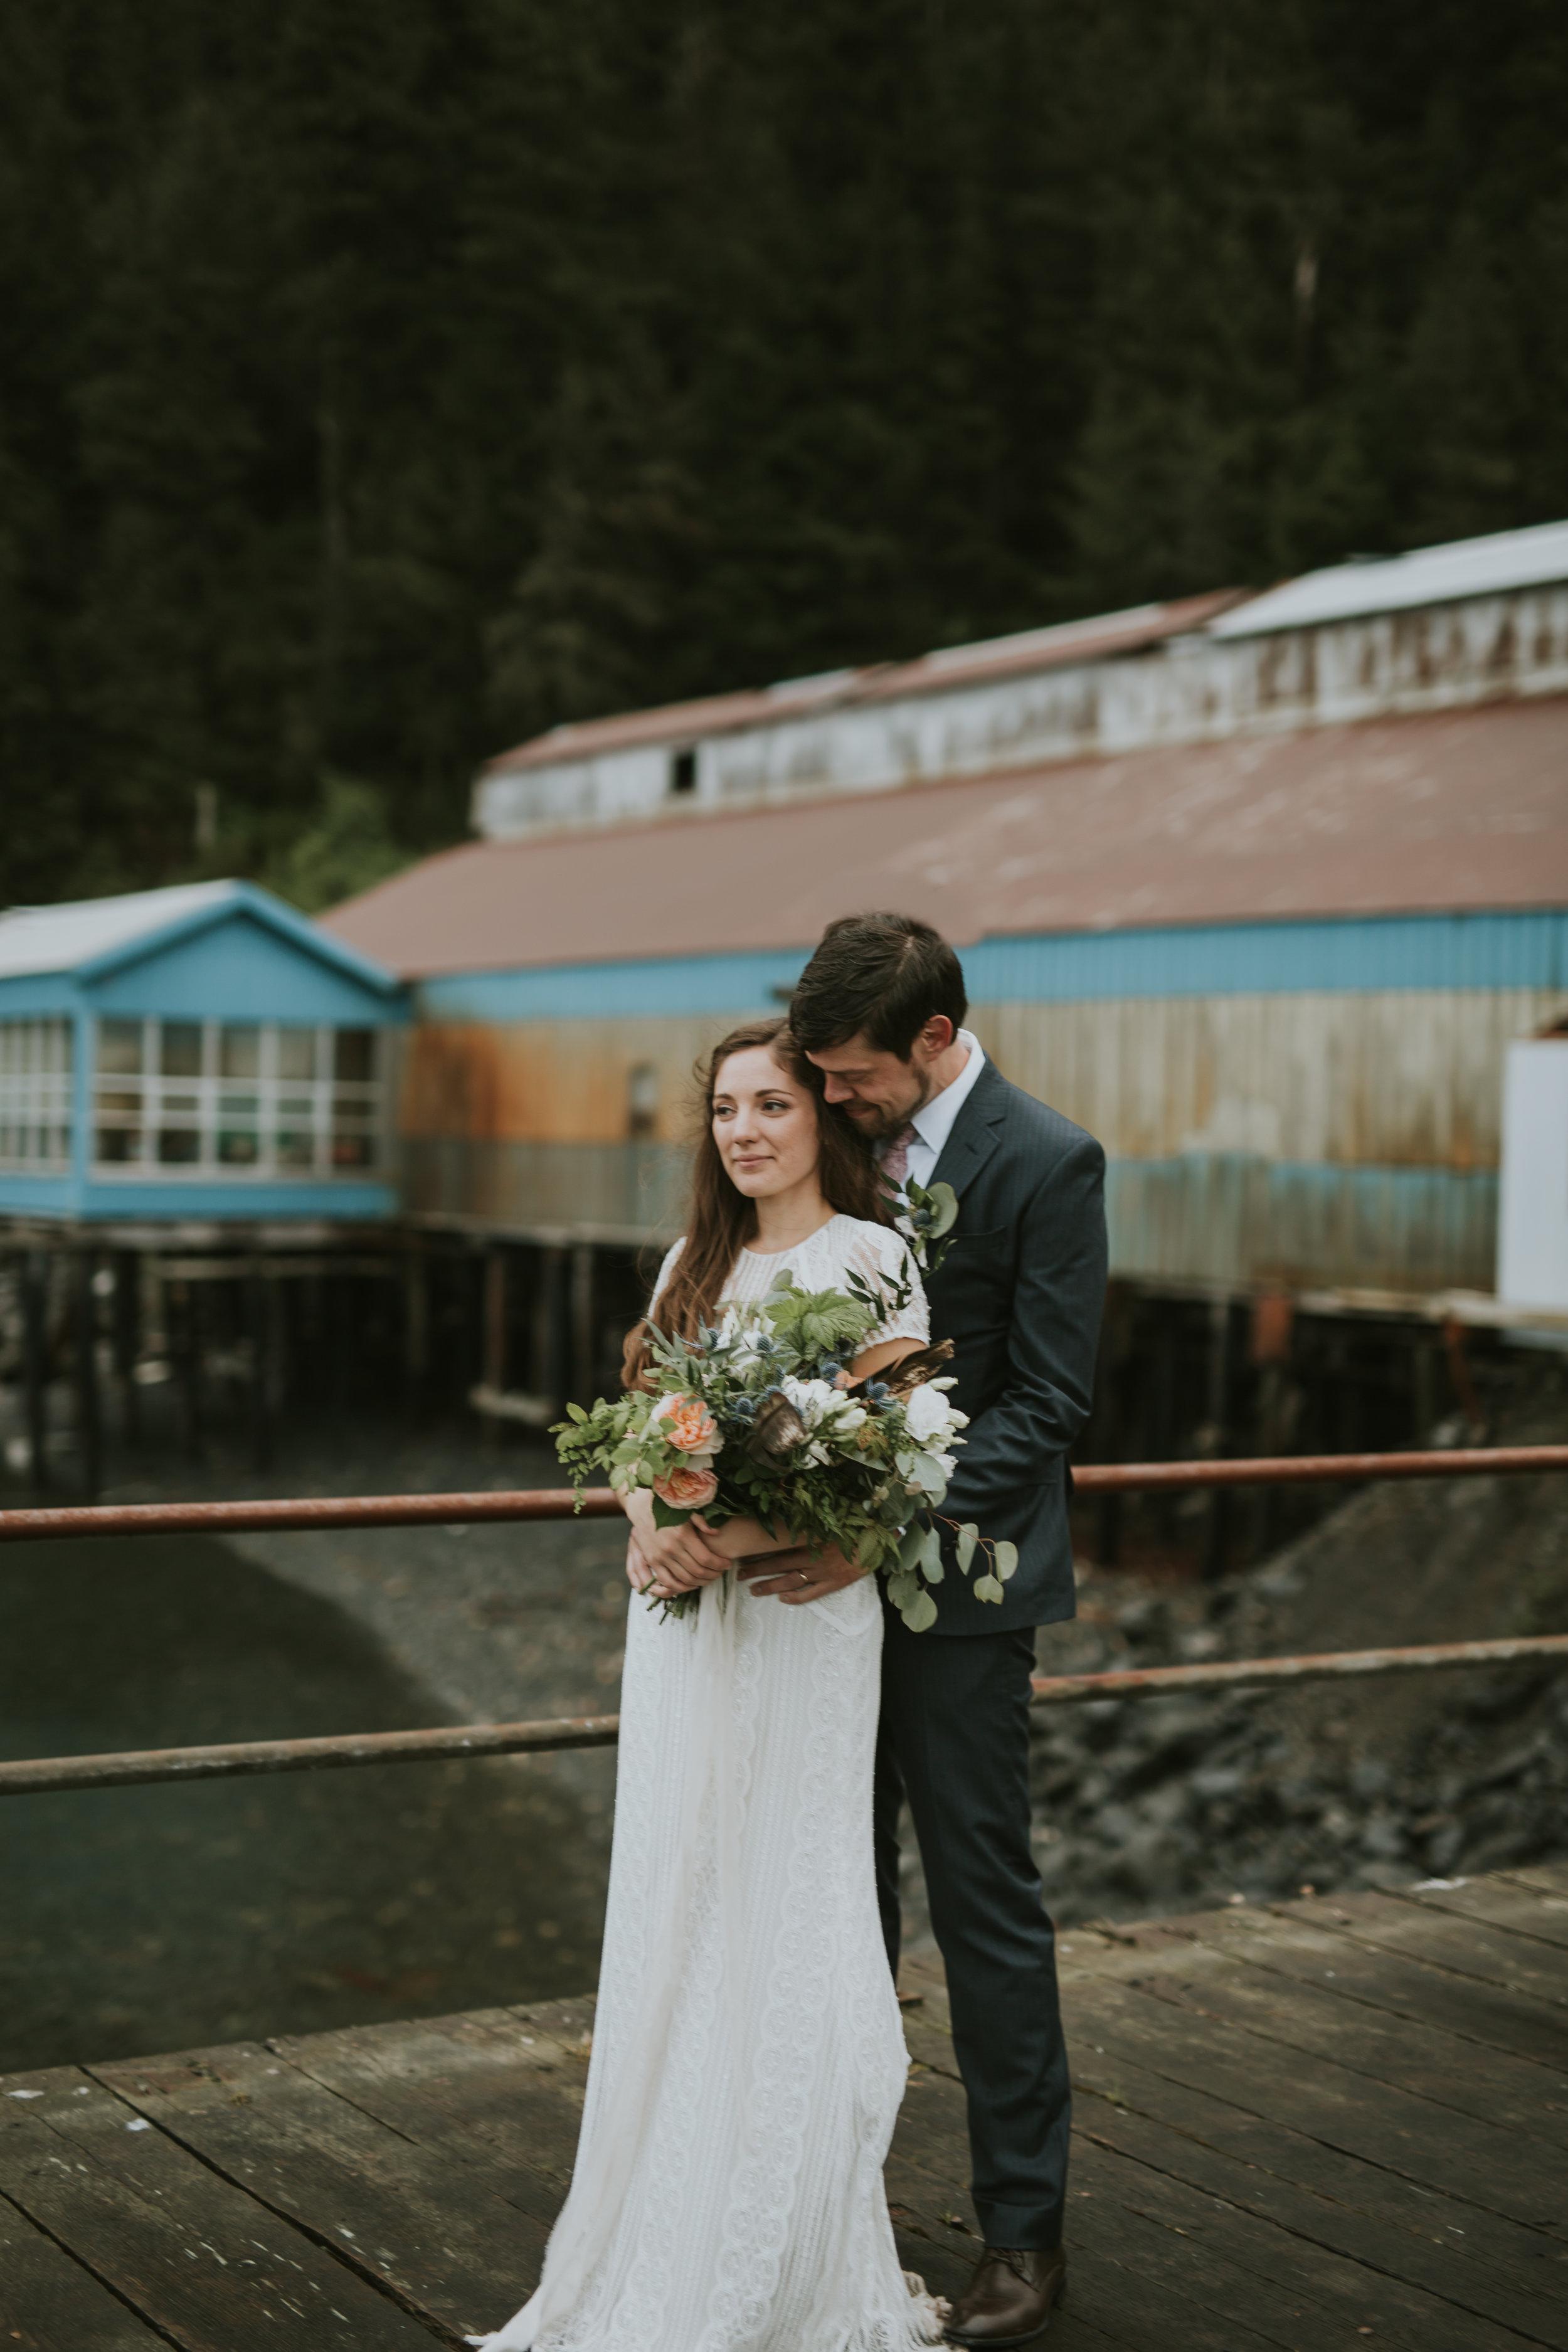 JEN AND DANNY WEDDING - CORDOVA, ALASKA